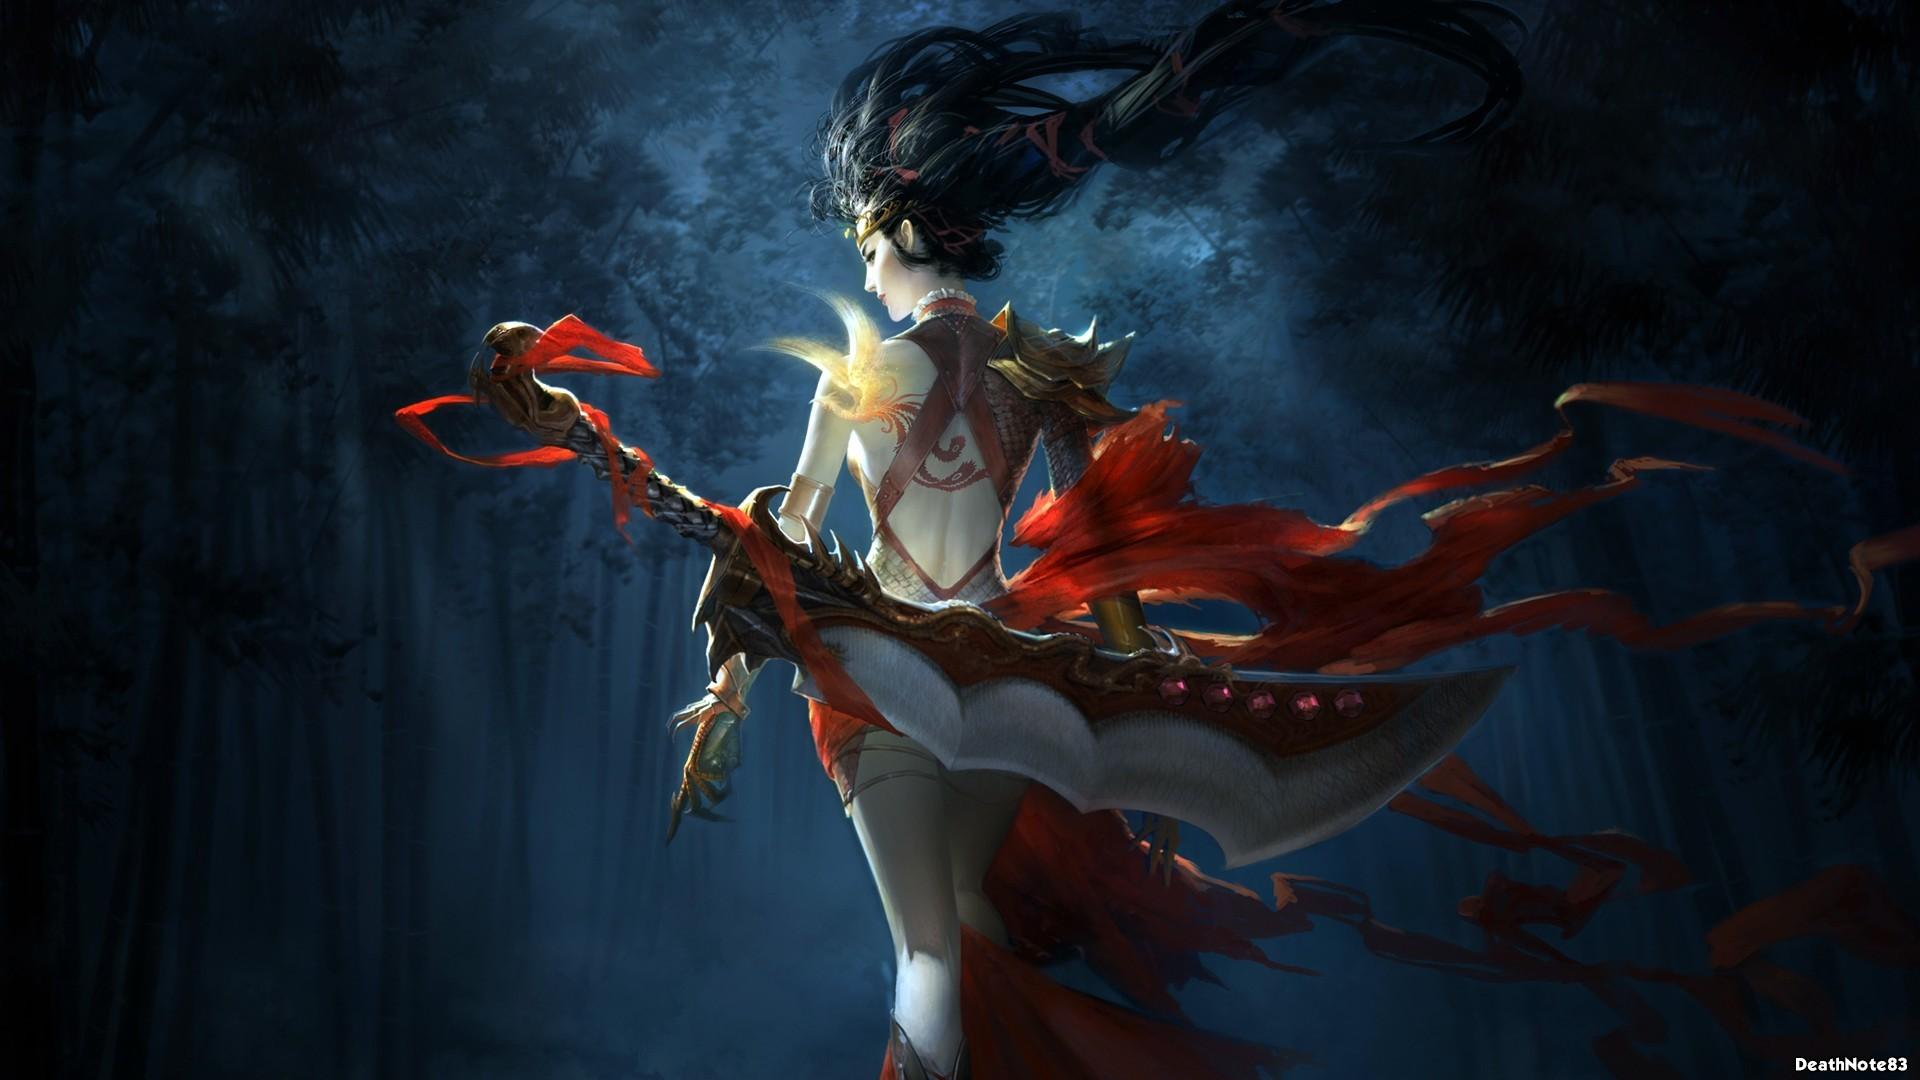 General 1920x1080 fantasy art women warrior sword red